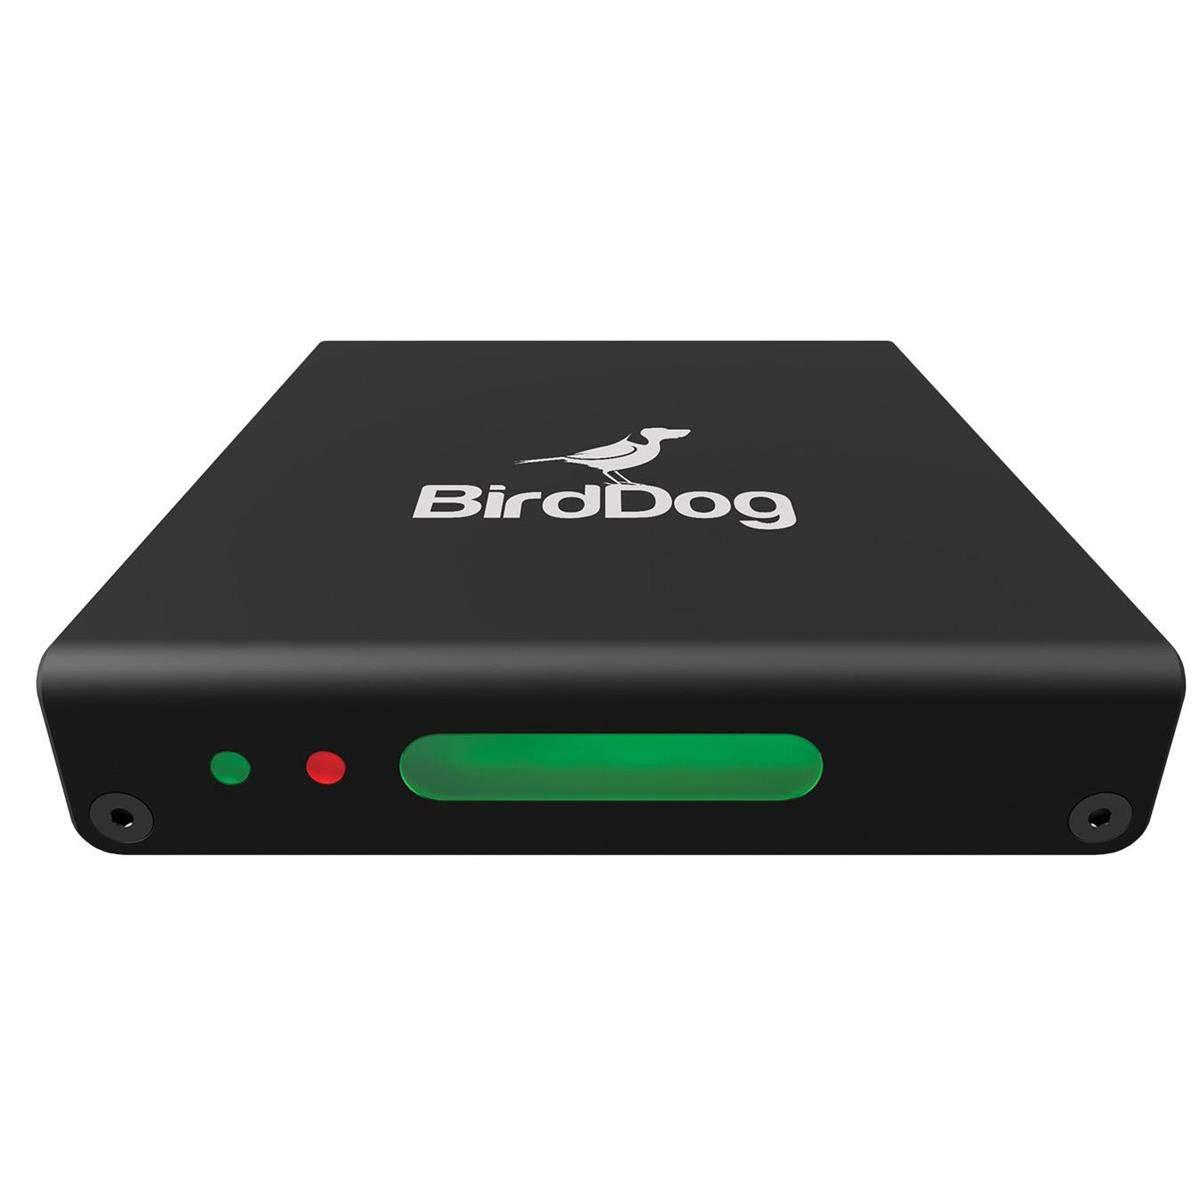 BirdDog Mini HDMI to NDI Encoder: Amazon.com.au: Electronics